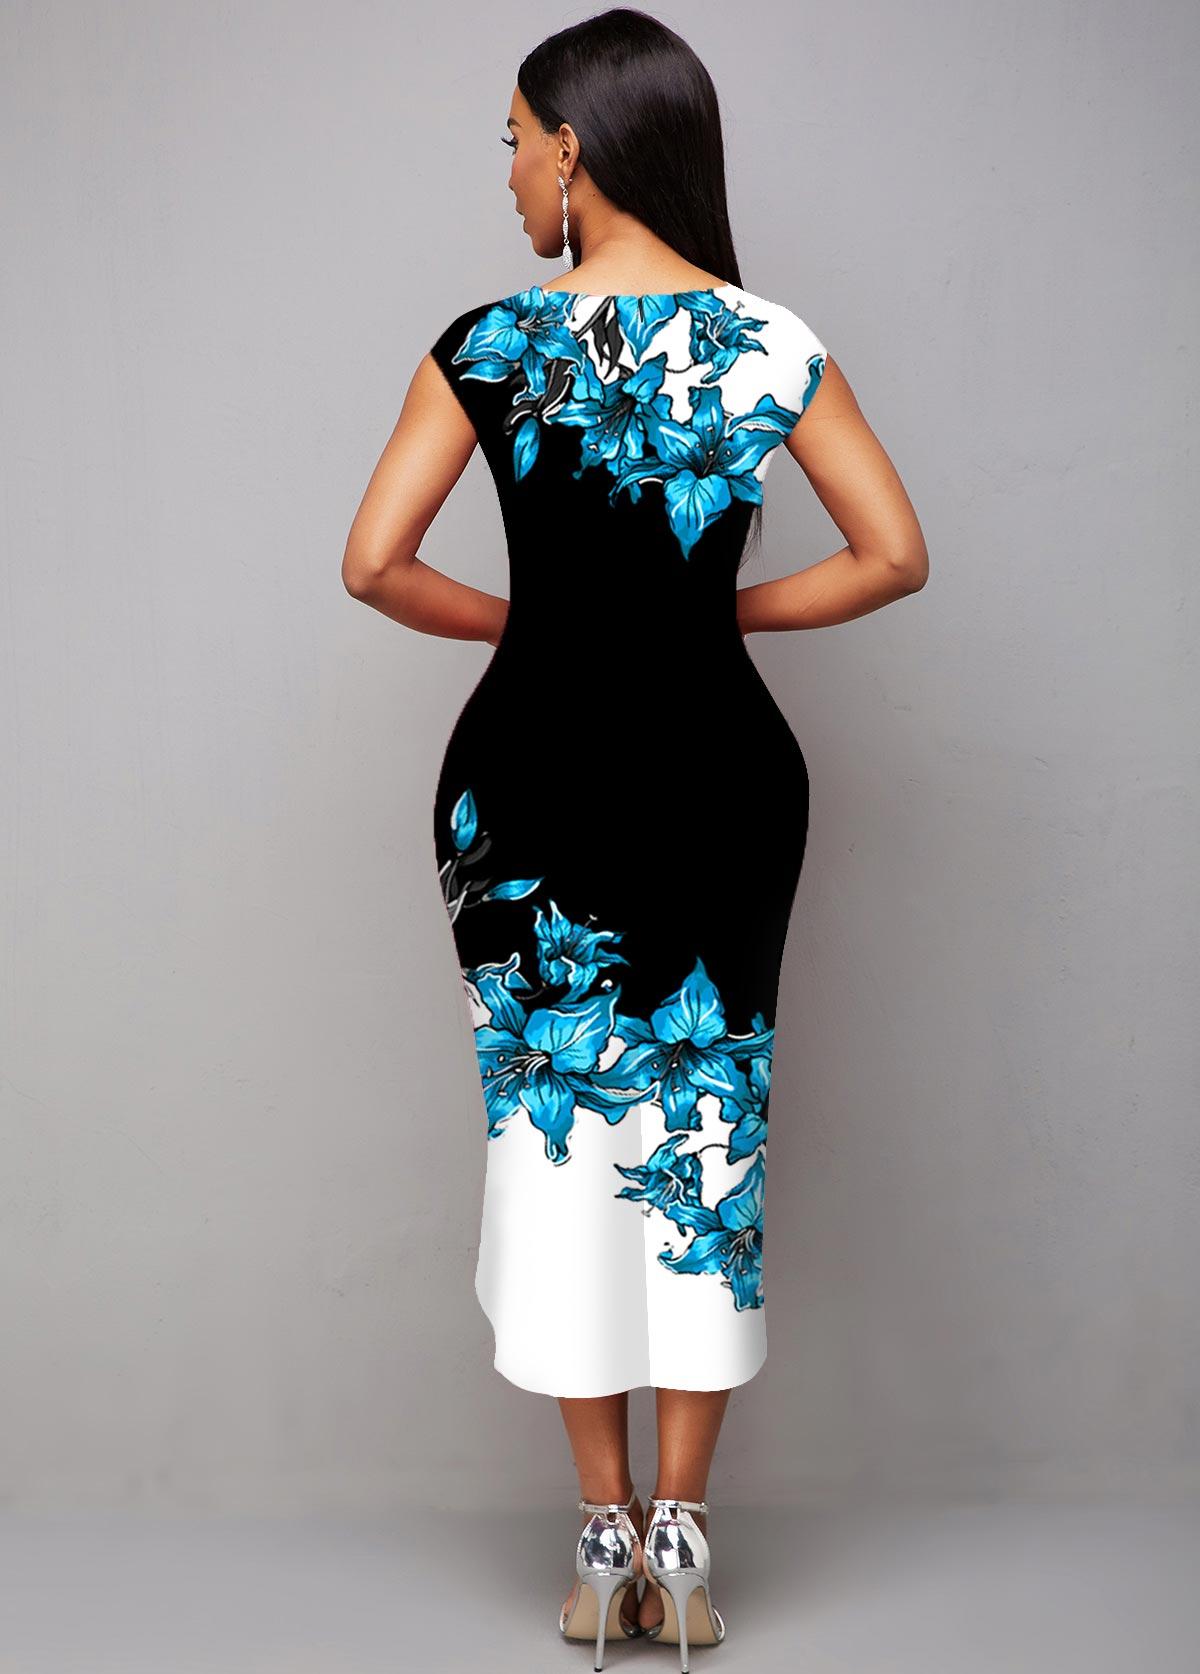 Floral Print Asymmetric Hem Contrast Dress